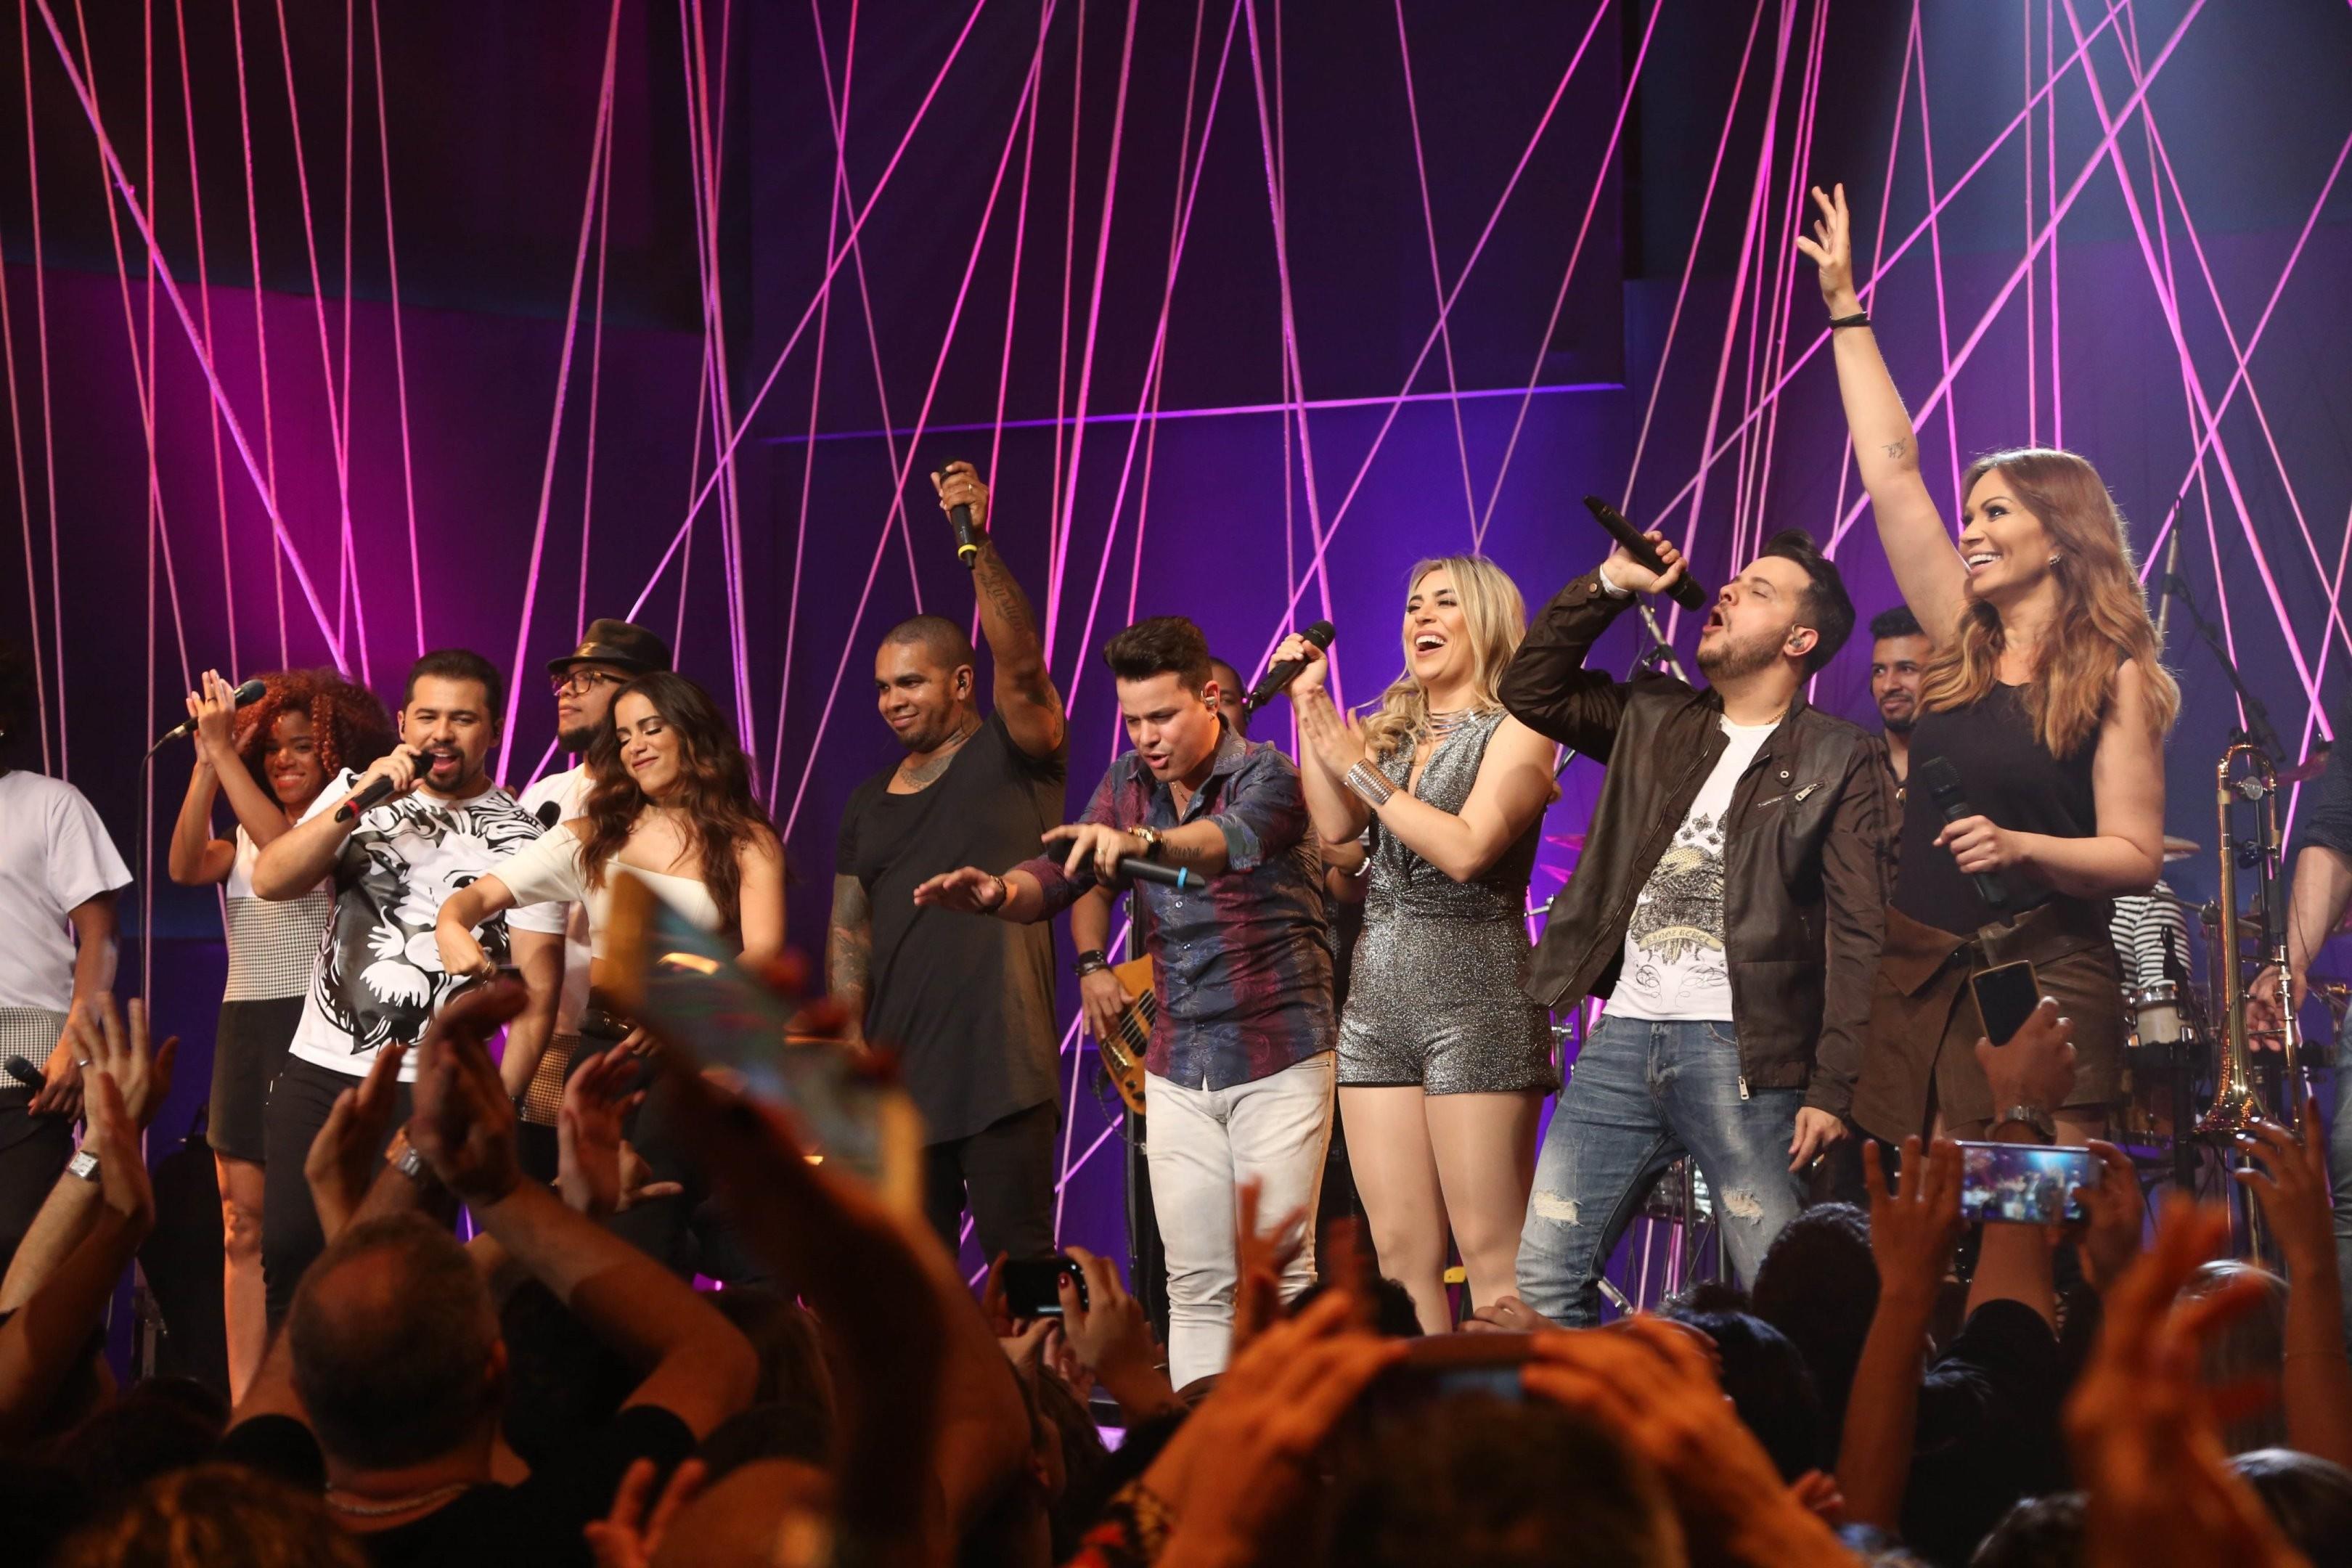 Avies do Forr, Joo Neto & Frederico, Naiara Azevedo, Rodriguinho e Anitta fizeram a festa no Msica Boa Ao Vivo (Foto: Multishow)